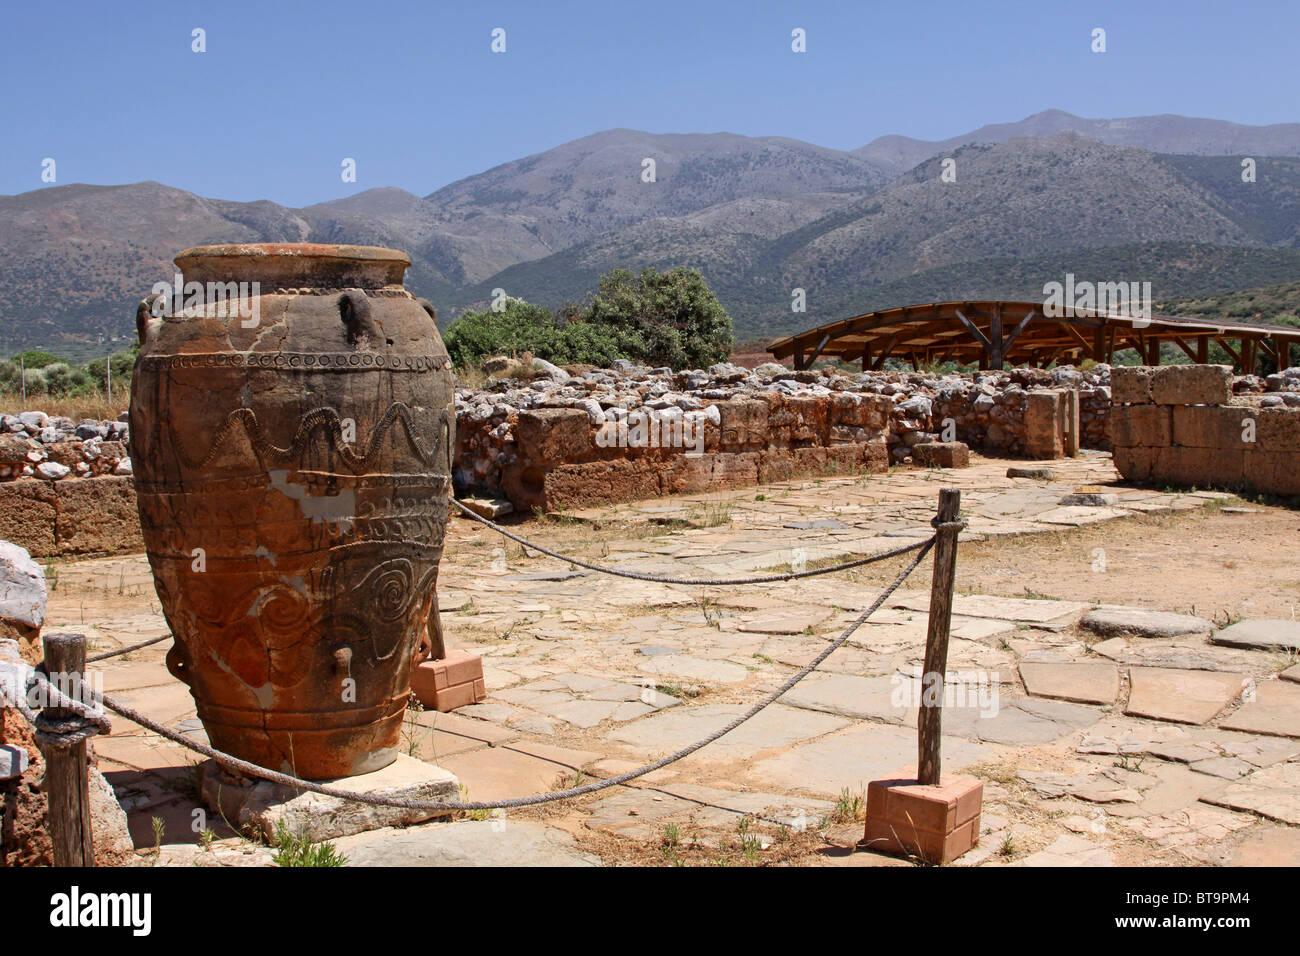 Clay jugs and jars, Malia Palace, Minoan excavations, archaeological excavation site, Heraklion, Crete, Greece, Stock Photo